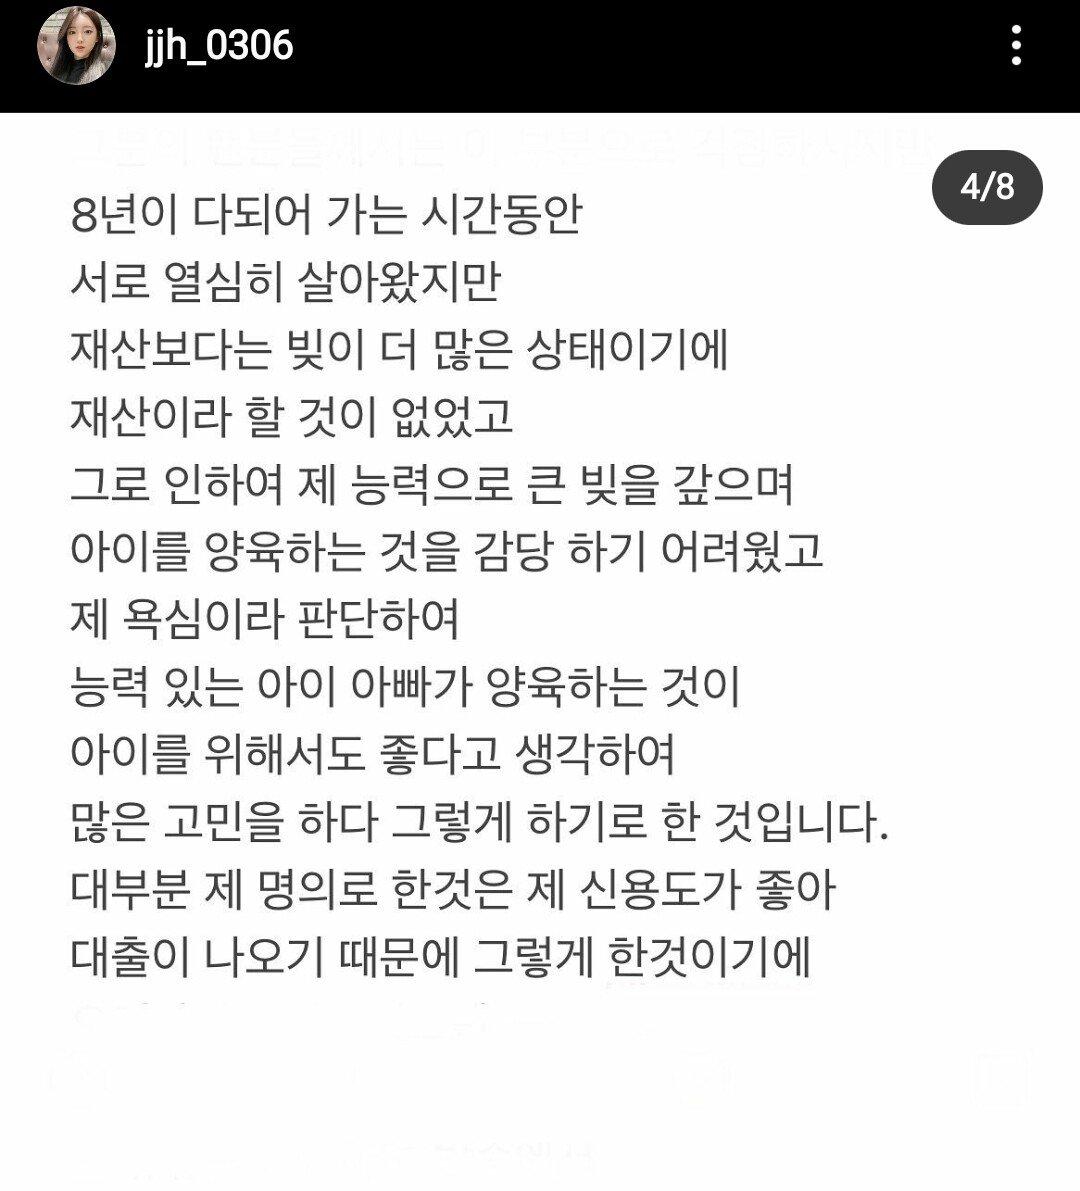 Screenshot_20210616-013135_Instagram.jpg [스압] BJ외질혜 인스타 피드사진 업로드....jpg